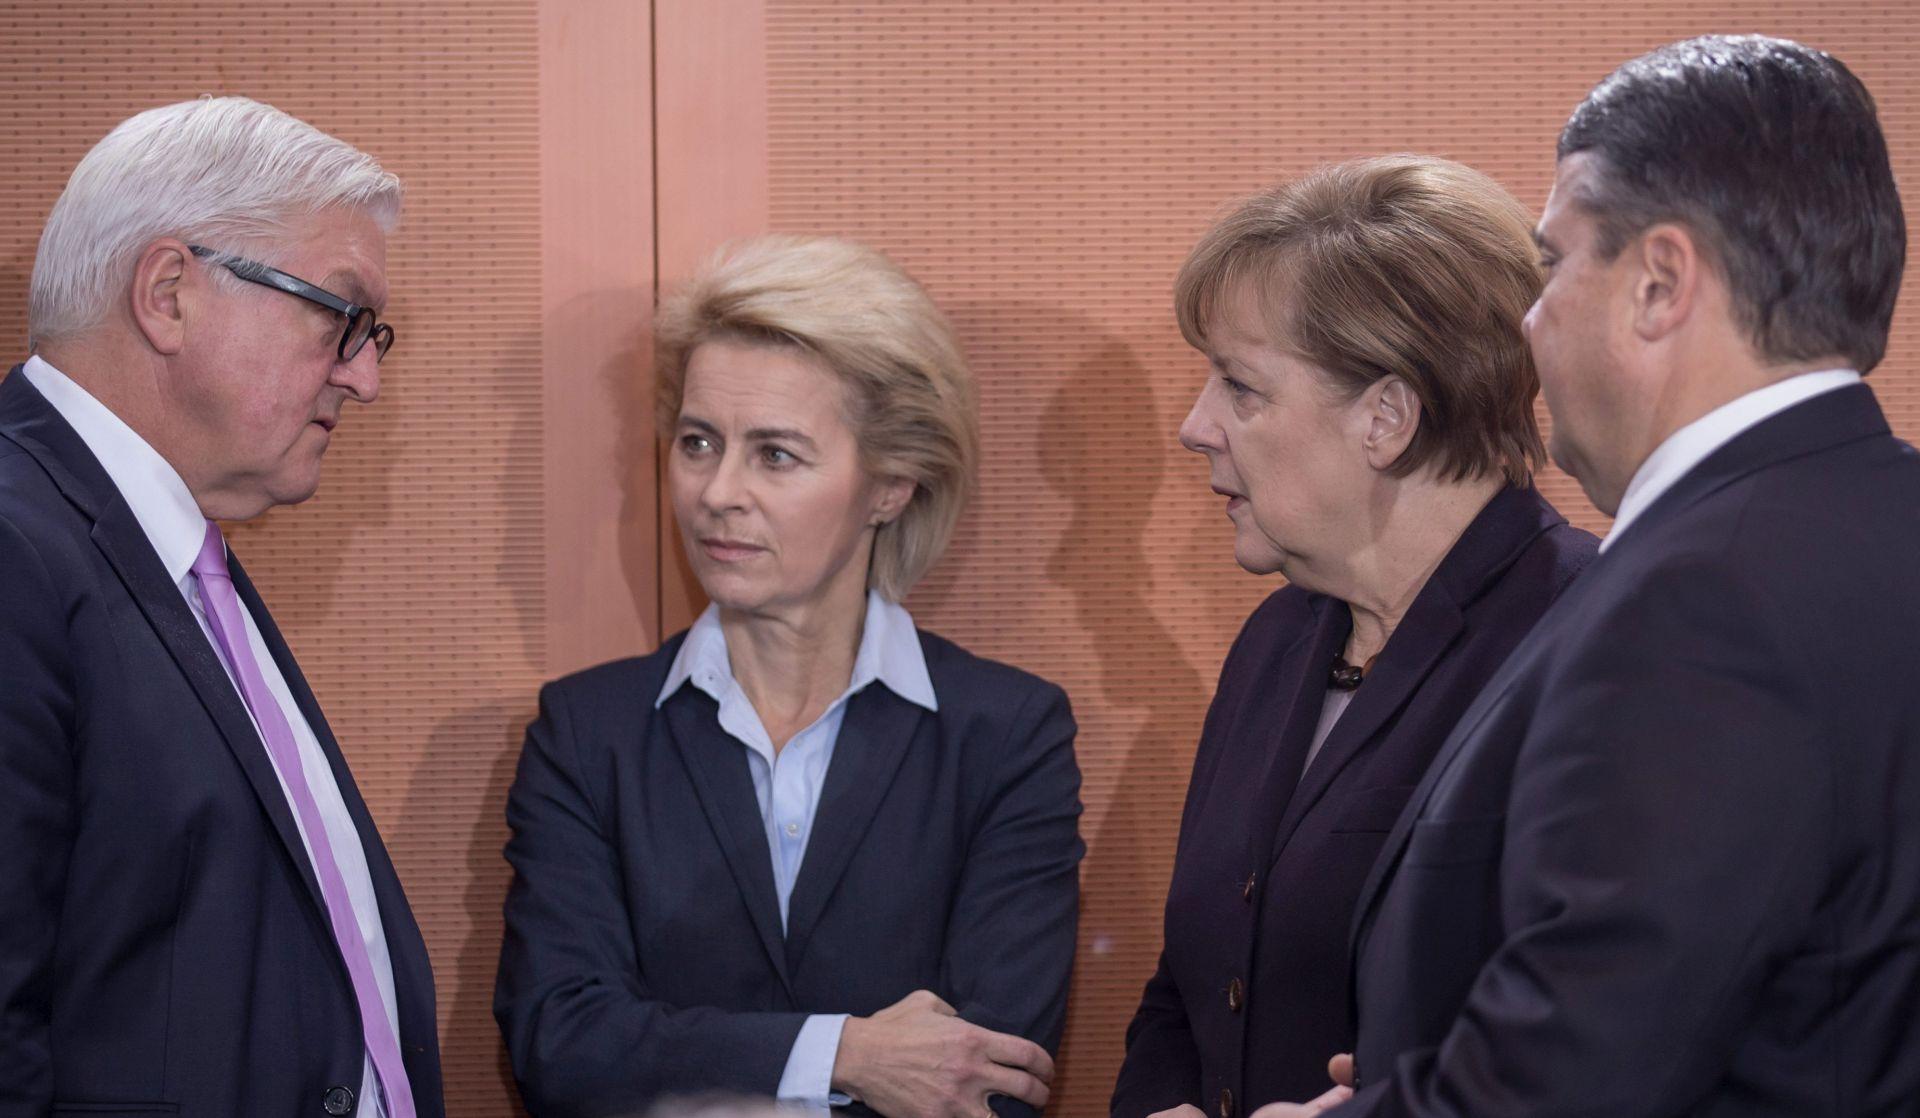 SUDJELUJE 1200 VOJNIKA: Bundestag raspravljao o misiji protiv IS-a